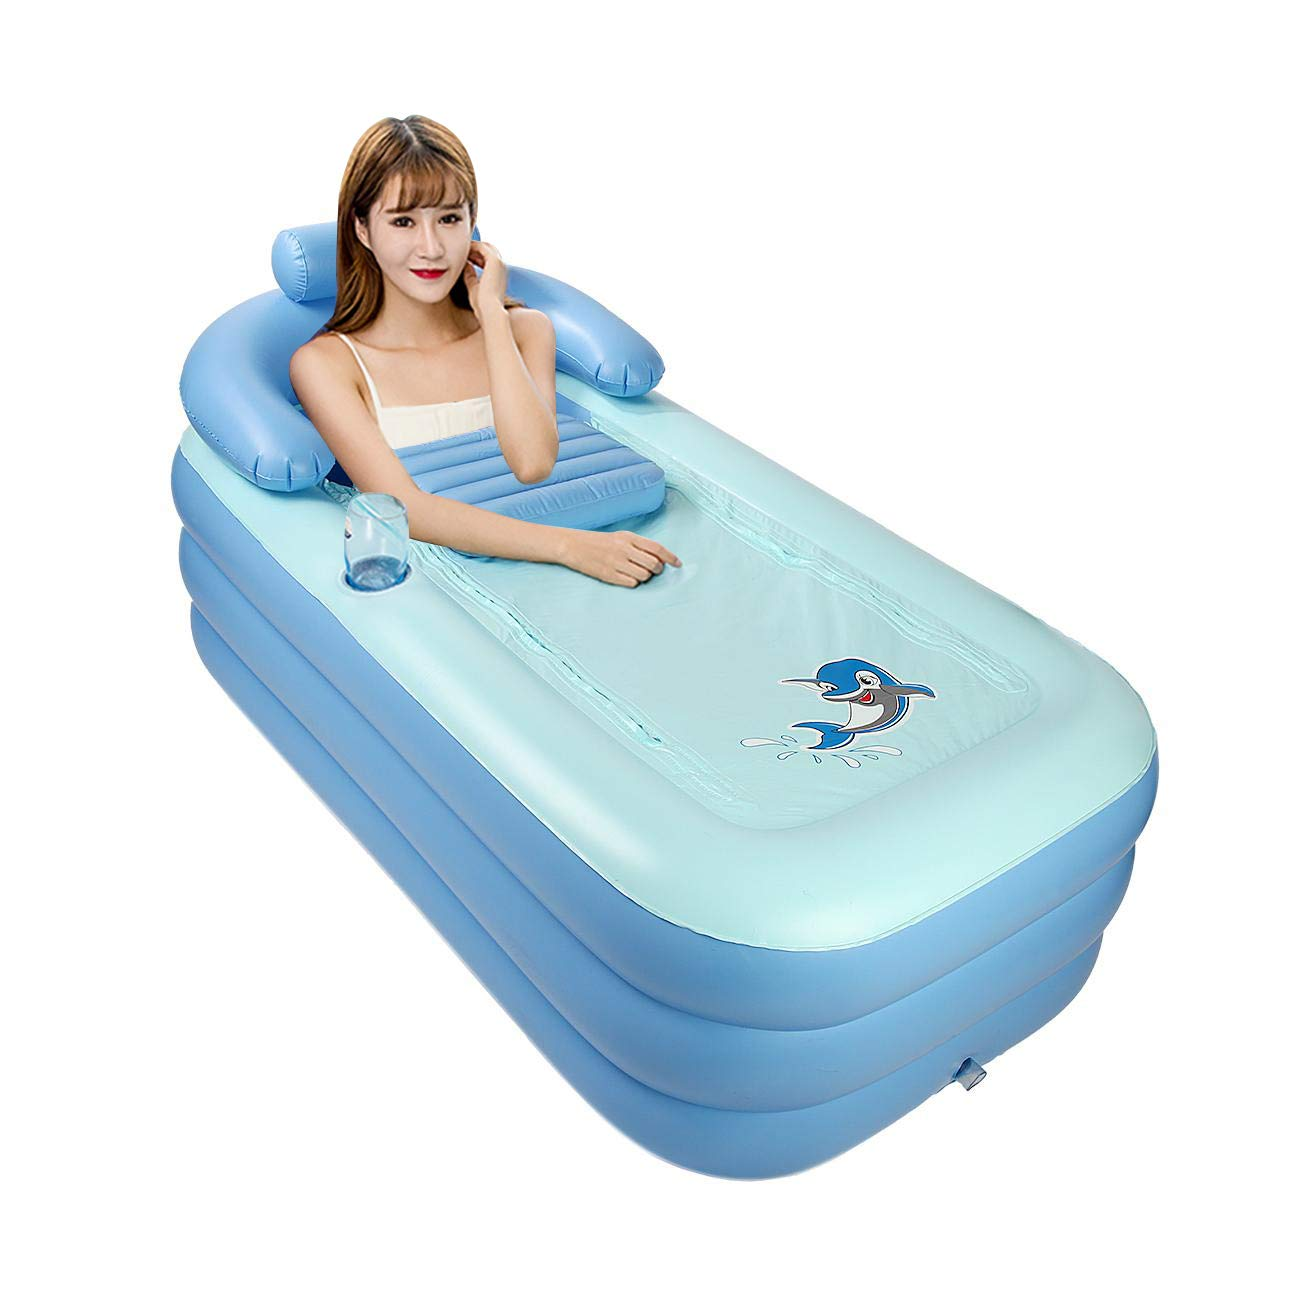 1608464cm WICHEMI Inflatable Bath Tub PVC Portable Foldable Adult Soaking Tub Shower Basin Free Standing Bathtub Home SPA Bath Equip with Electric Air Pump